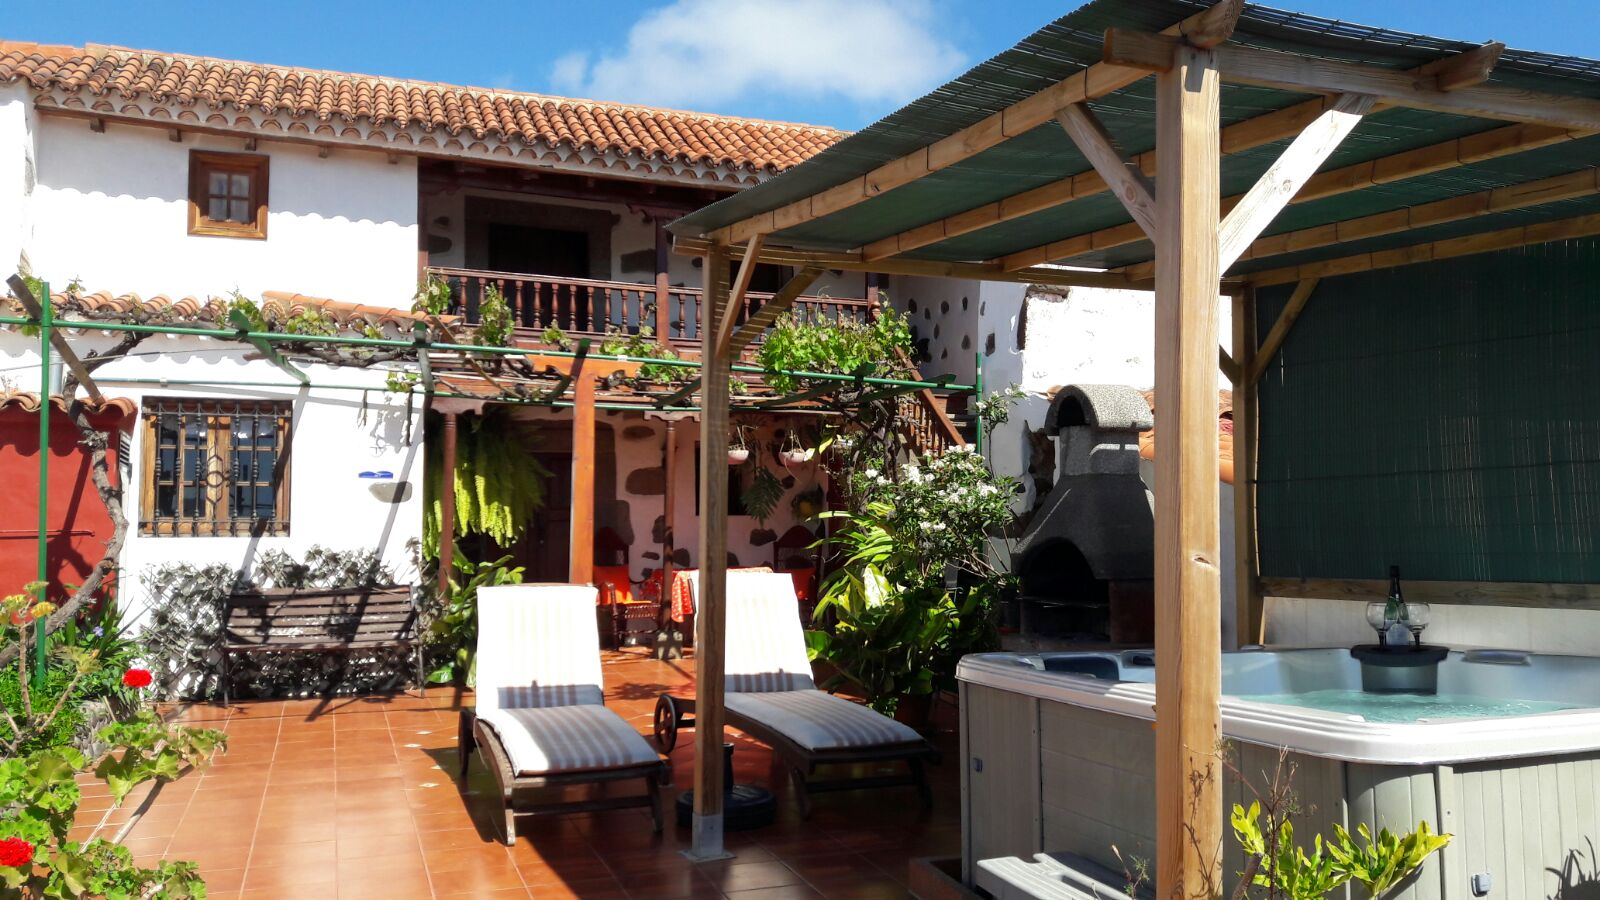 Natura canaria alojamientos rurales - Can caponet casa rural ...